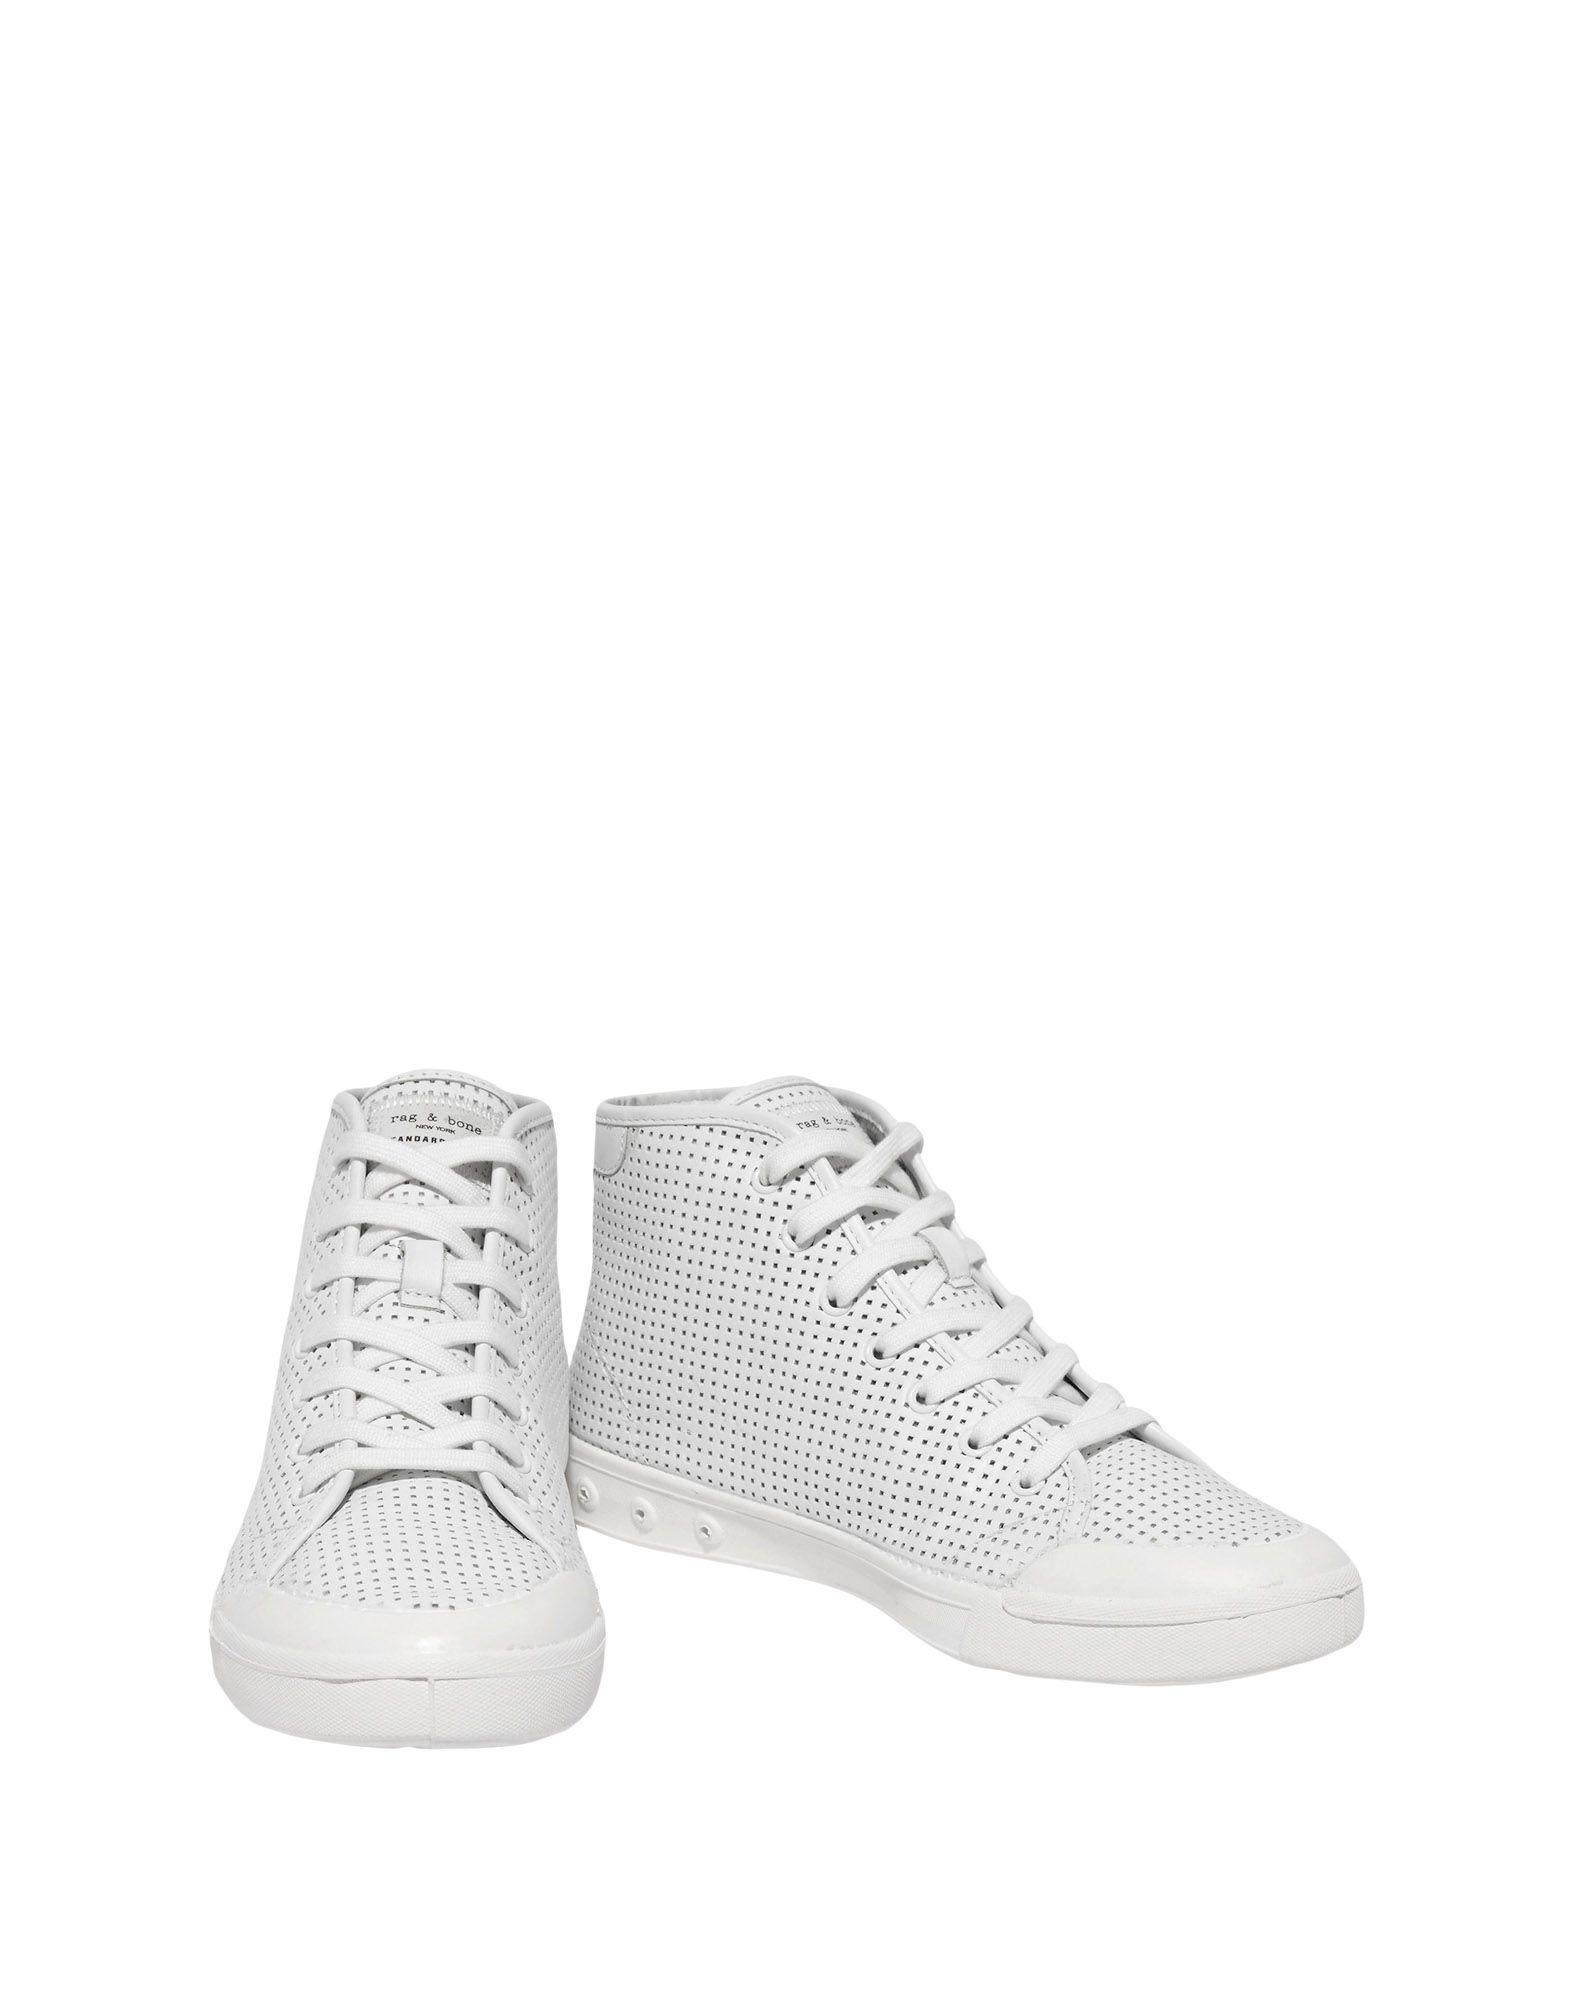 Rag & Bone Sneakers - Women Women Women Rag & Bone Sneakers online on  United Kingdom - 11515864DH 0c916c